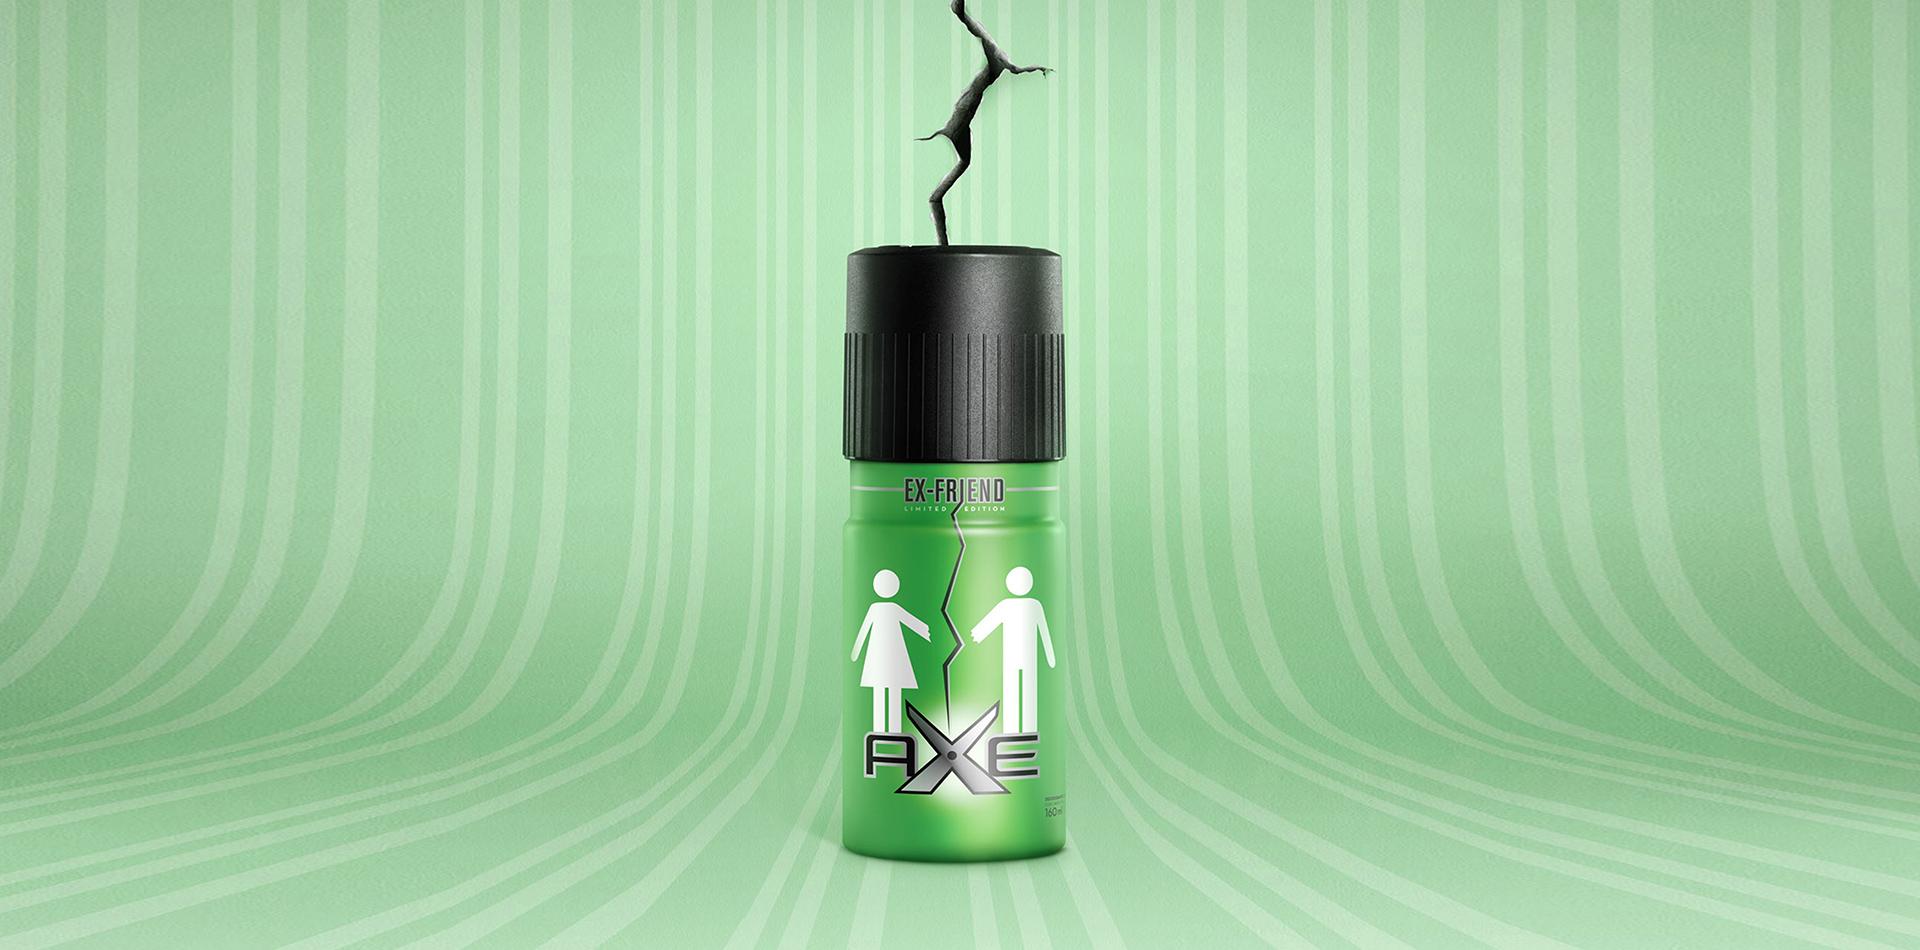 AXE ex Friend